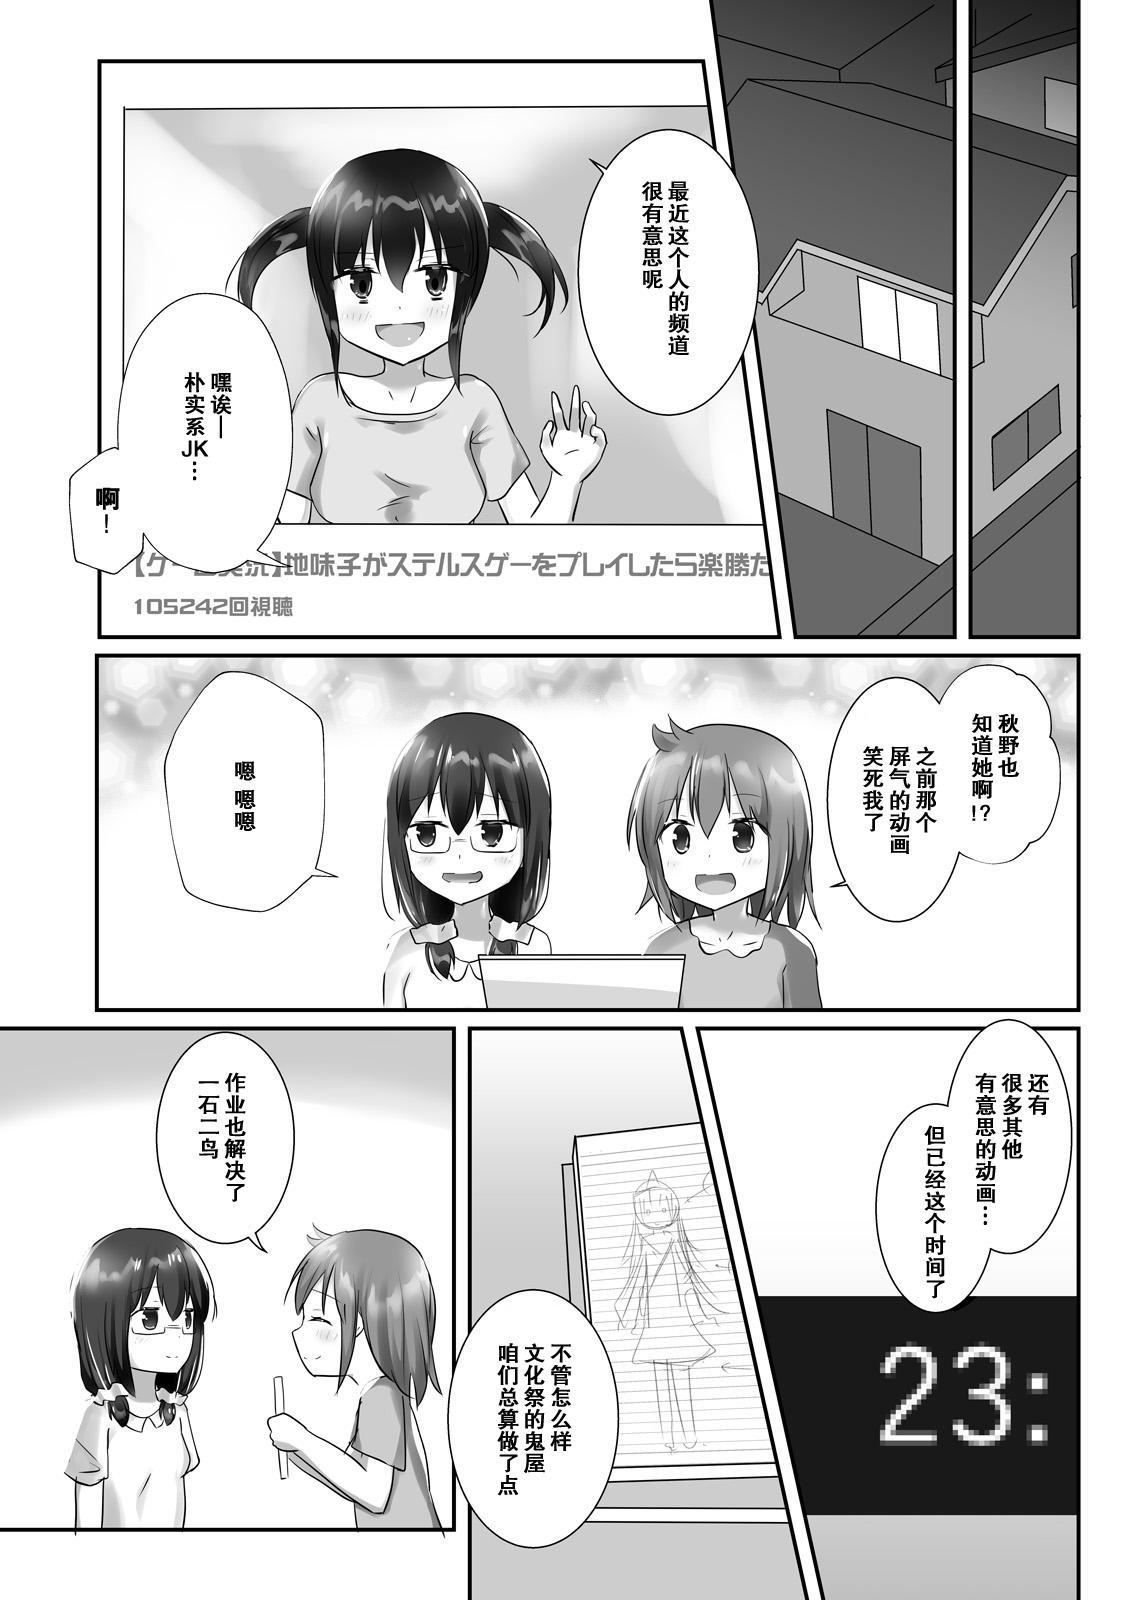 Yumewatari no Mistress night 5 28